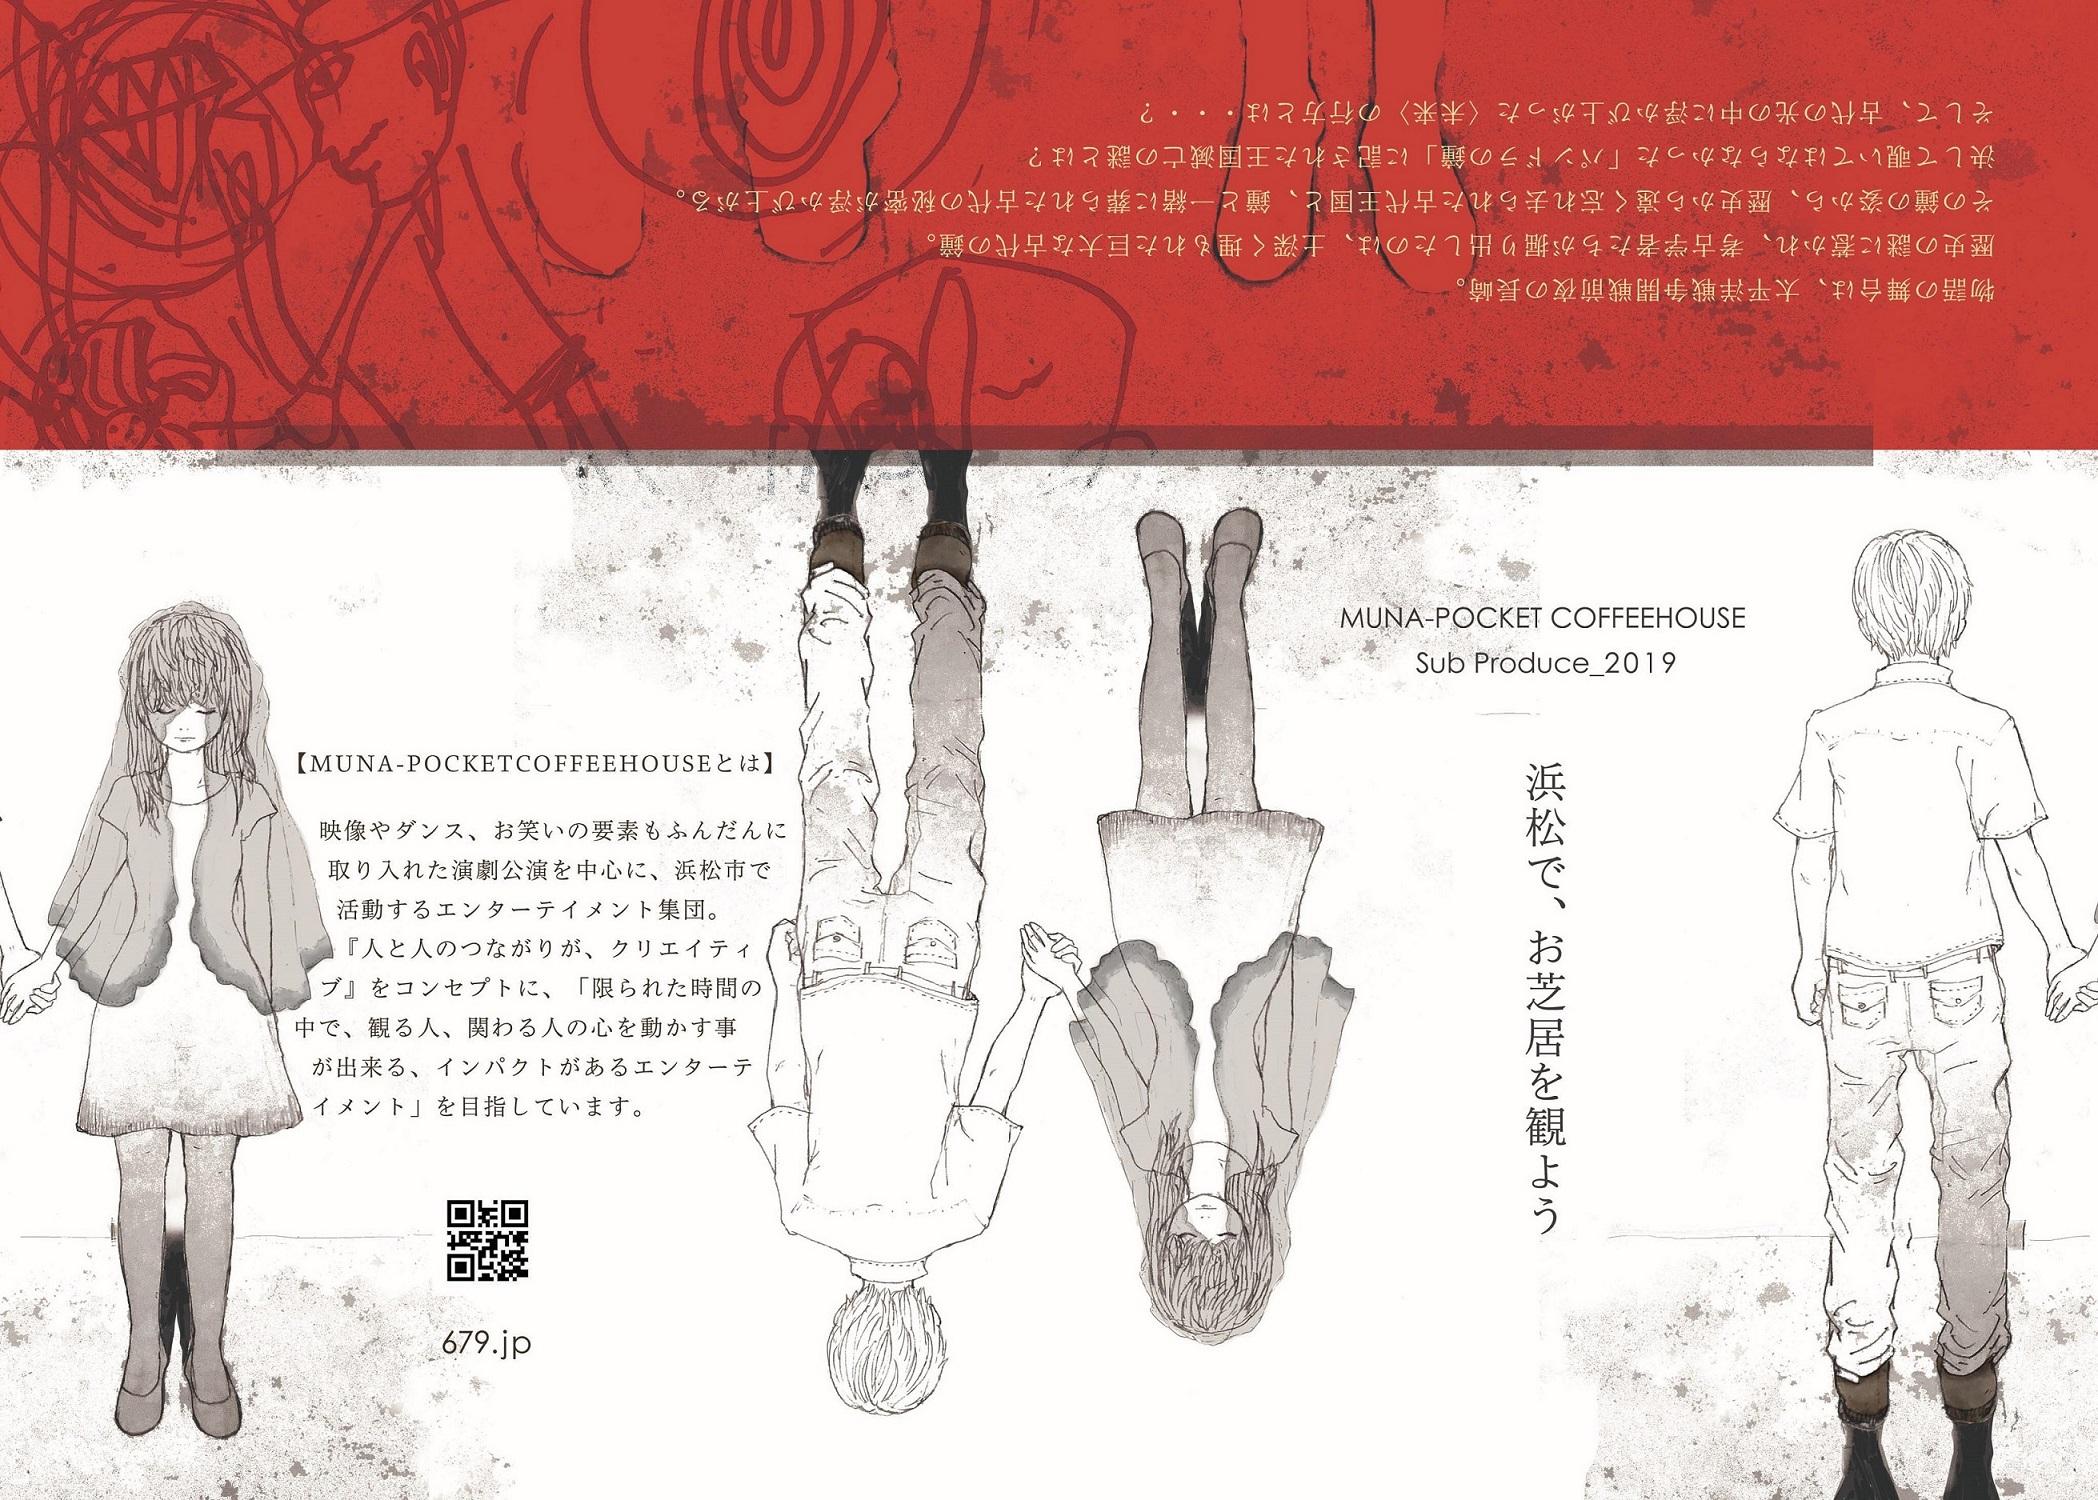 ☆WEB限定割引2回券☆5月25日(土) MUNA-POCKET COFFEEHOUSE(ムナポケ)演劇公演「パンドラの鐘」